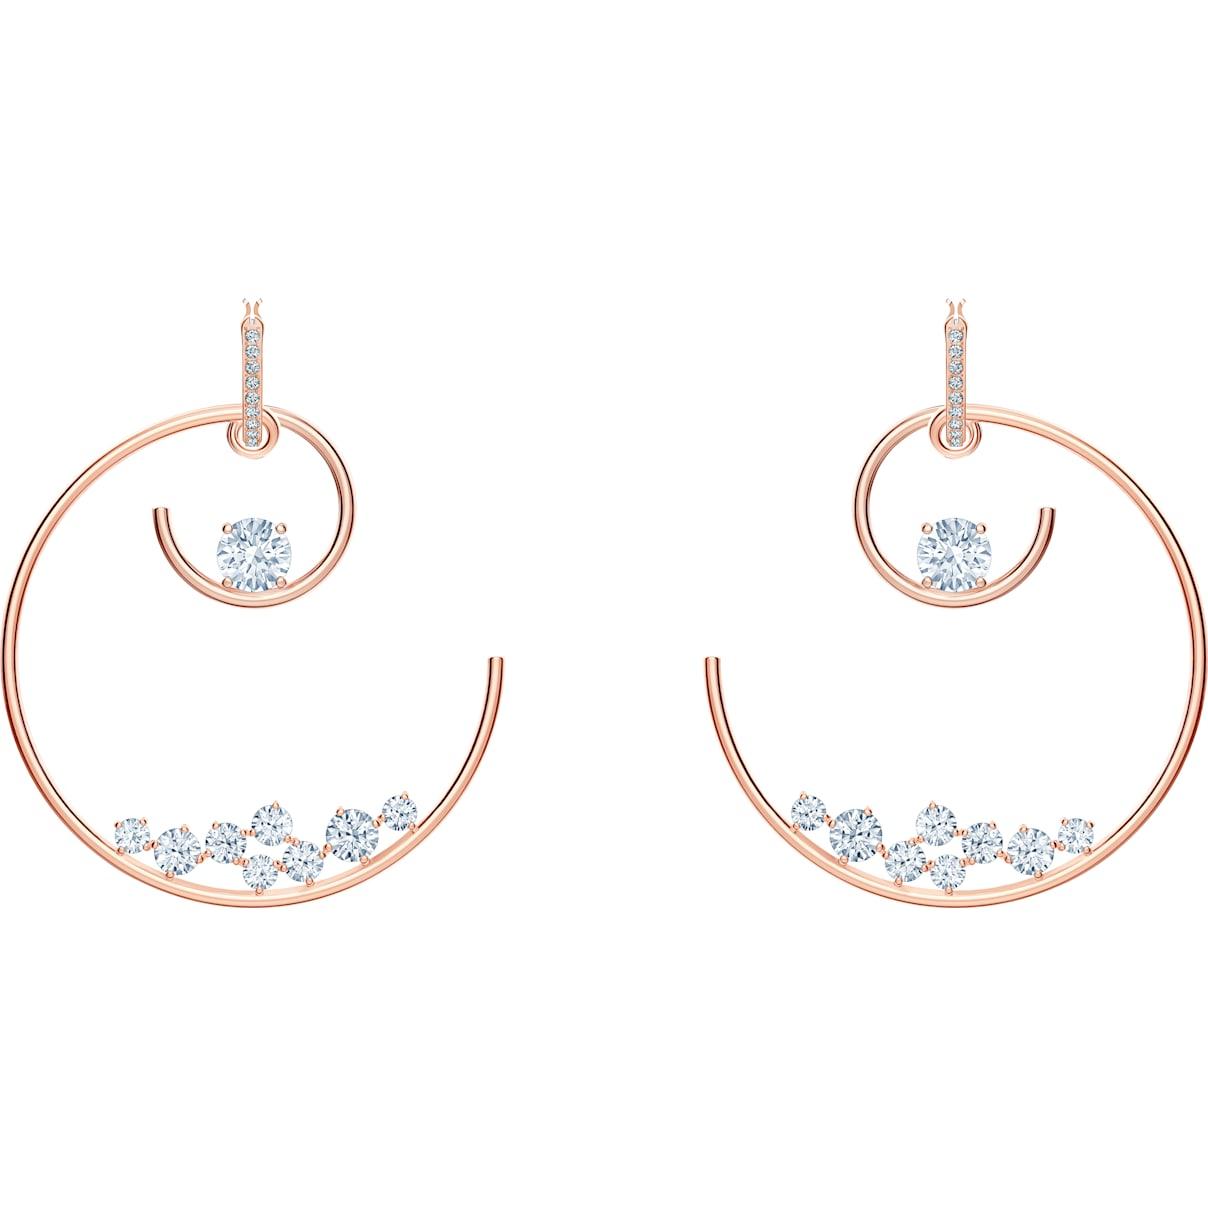 Swarovski North Hoop Pierced Earrings, White, Rose-gold tone plated